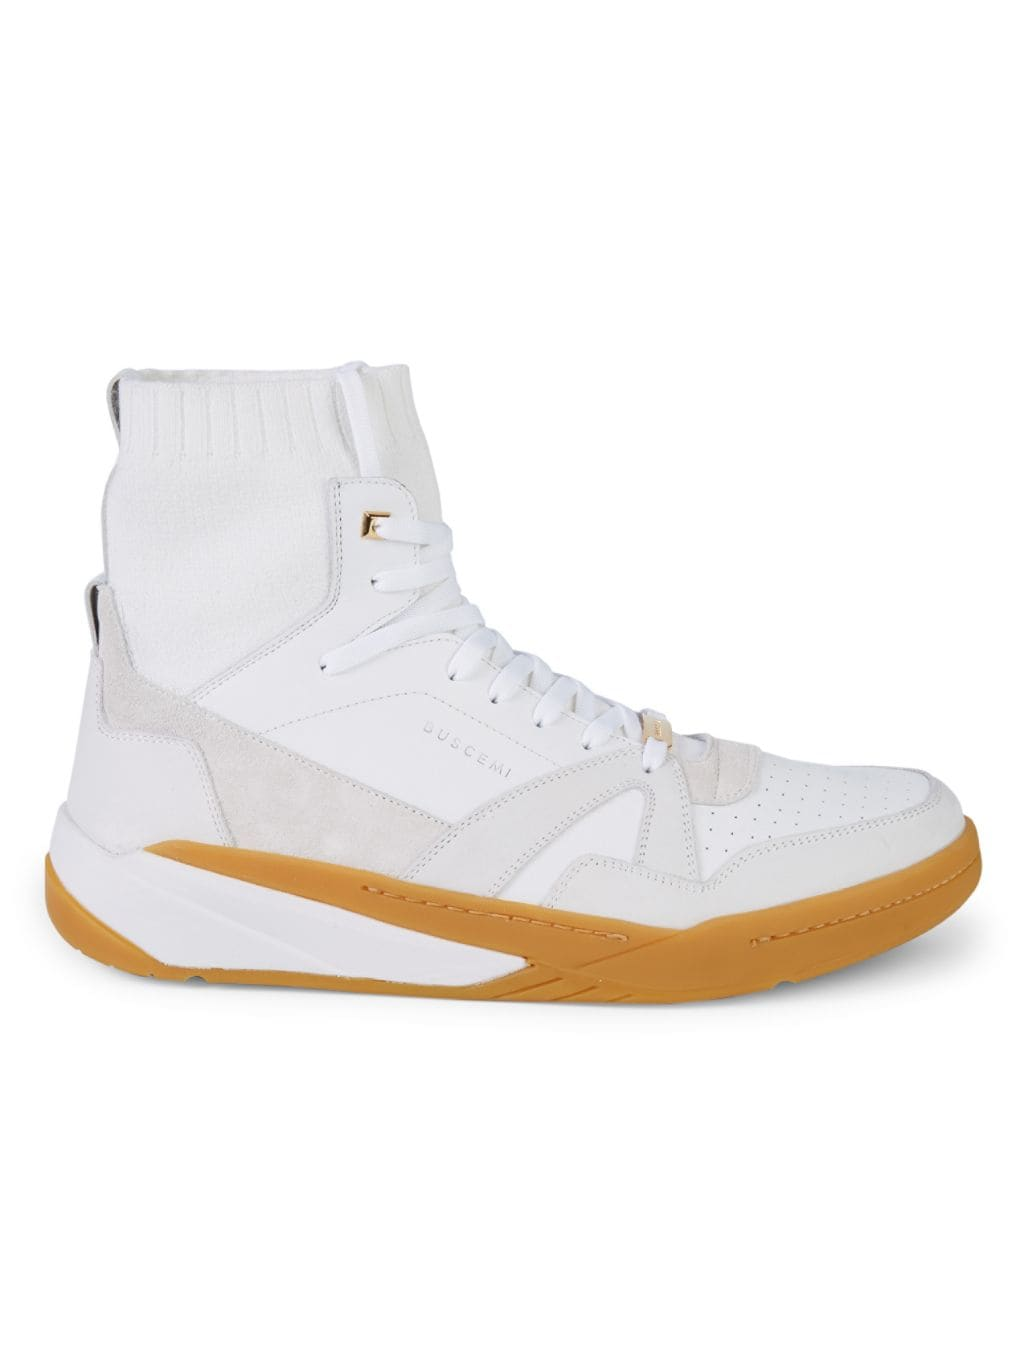 BUSCEMI Sock Sneakers